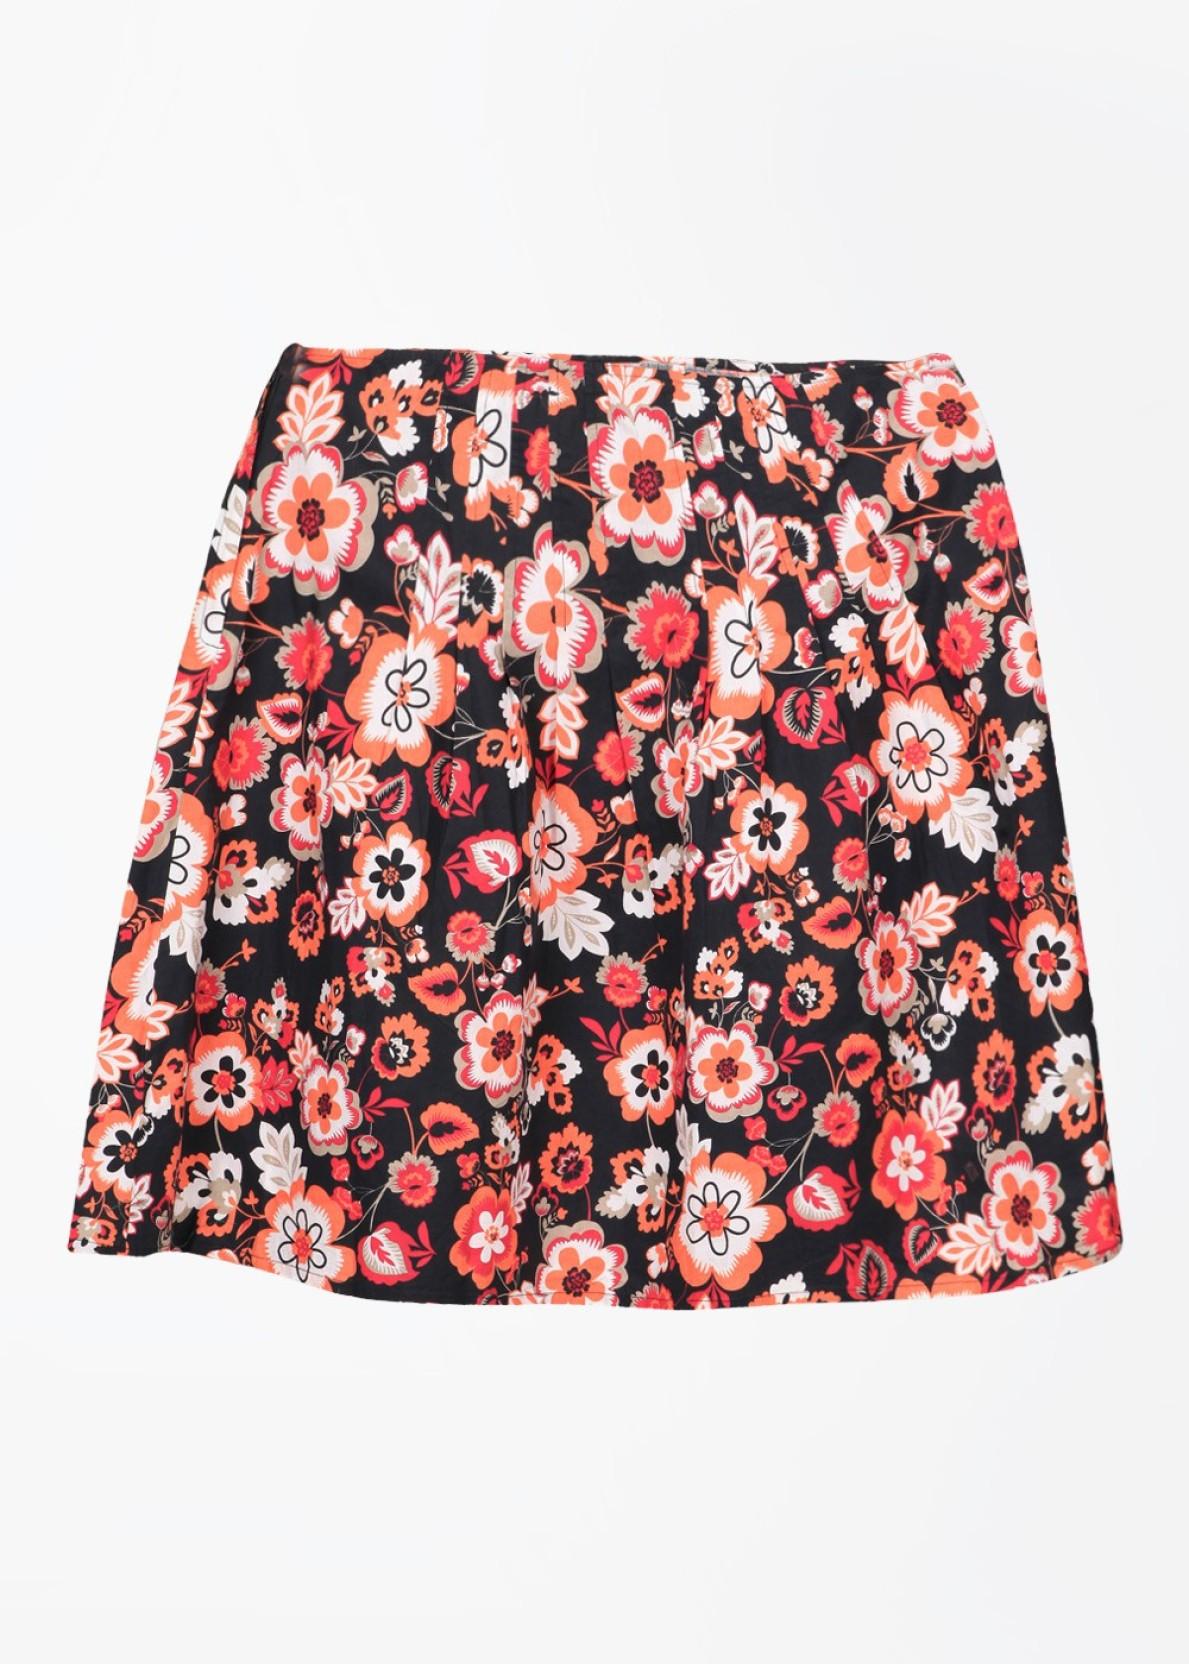 7f48ea706e9a Debenhams-Casual Club Womens Printed Women Straight Multicolor Skirt. Home  · Clothing